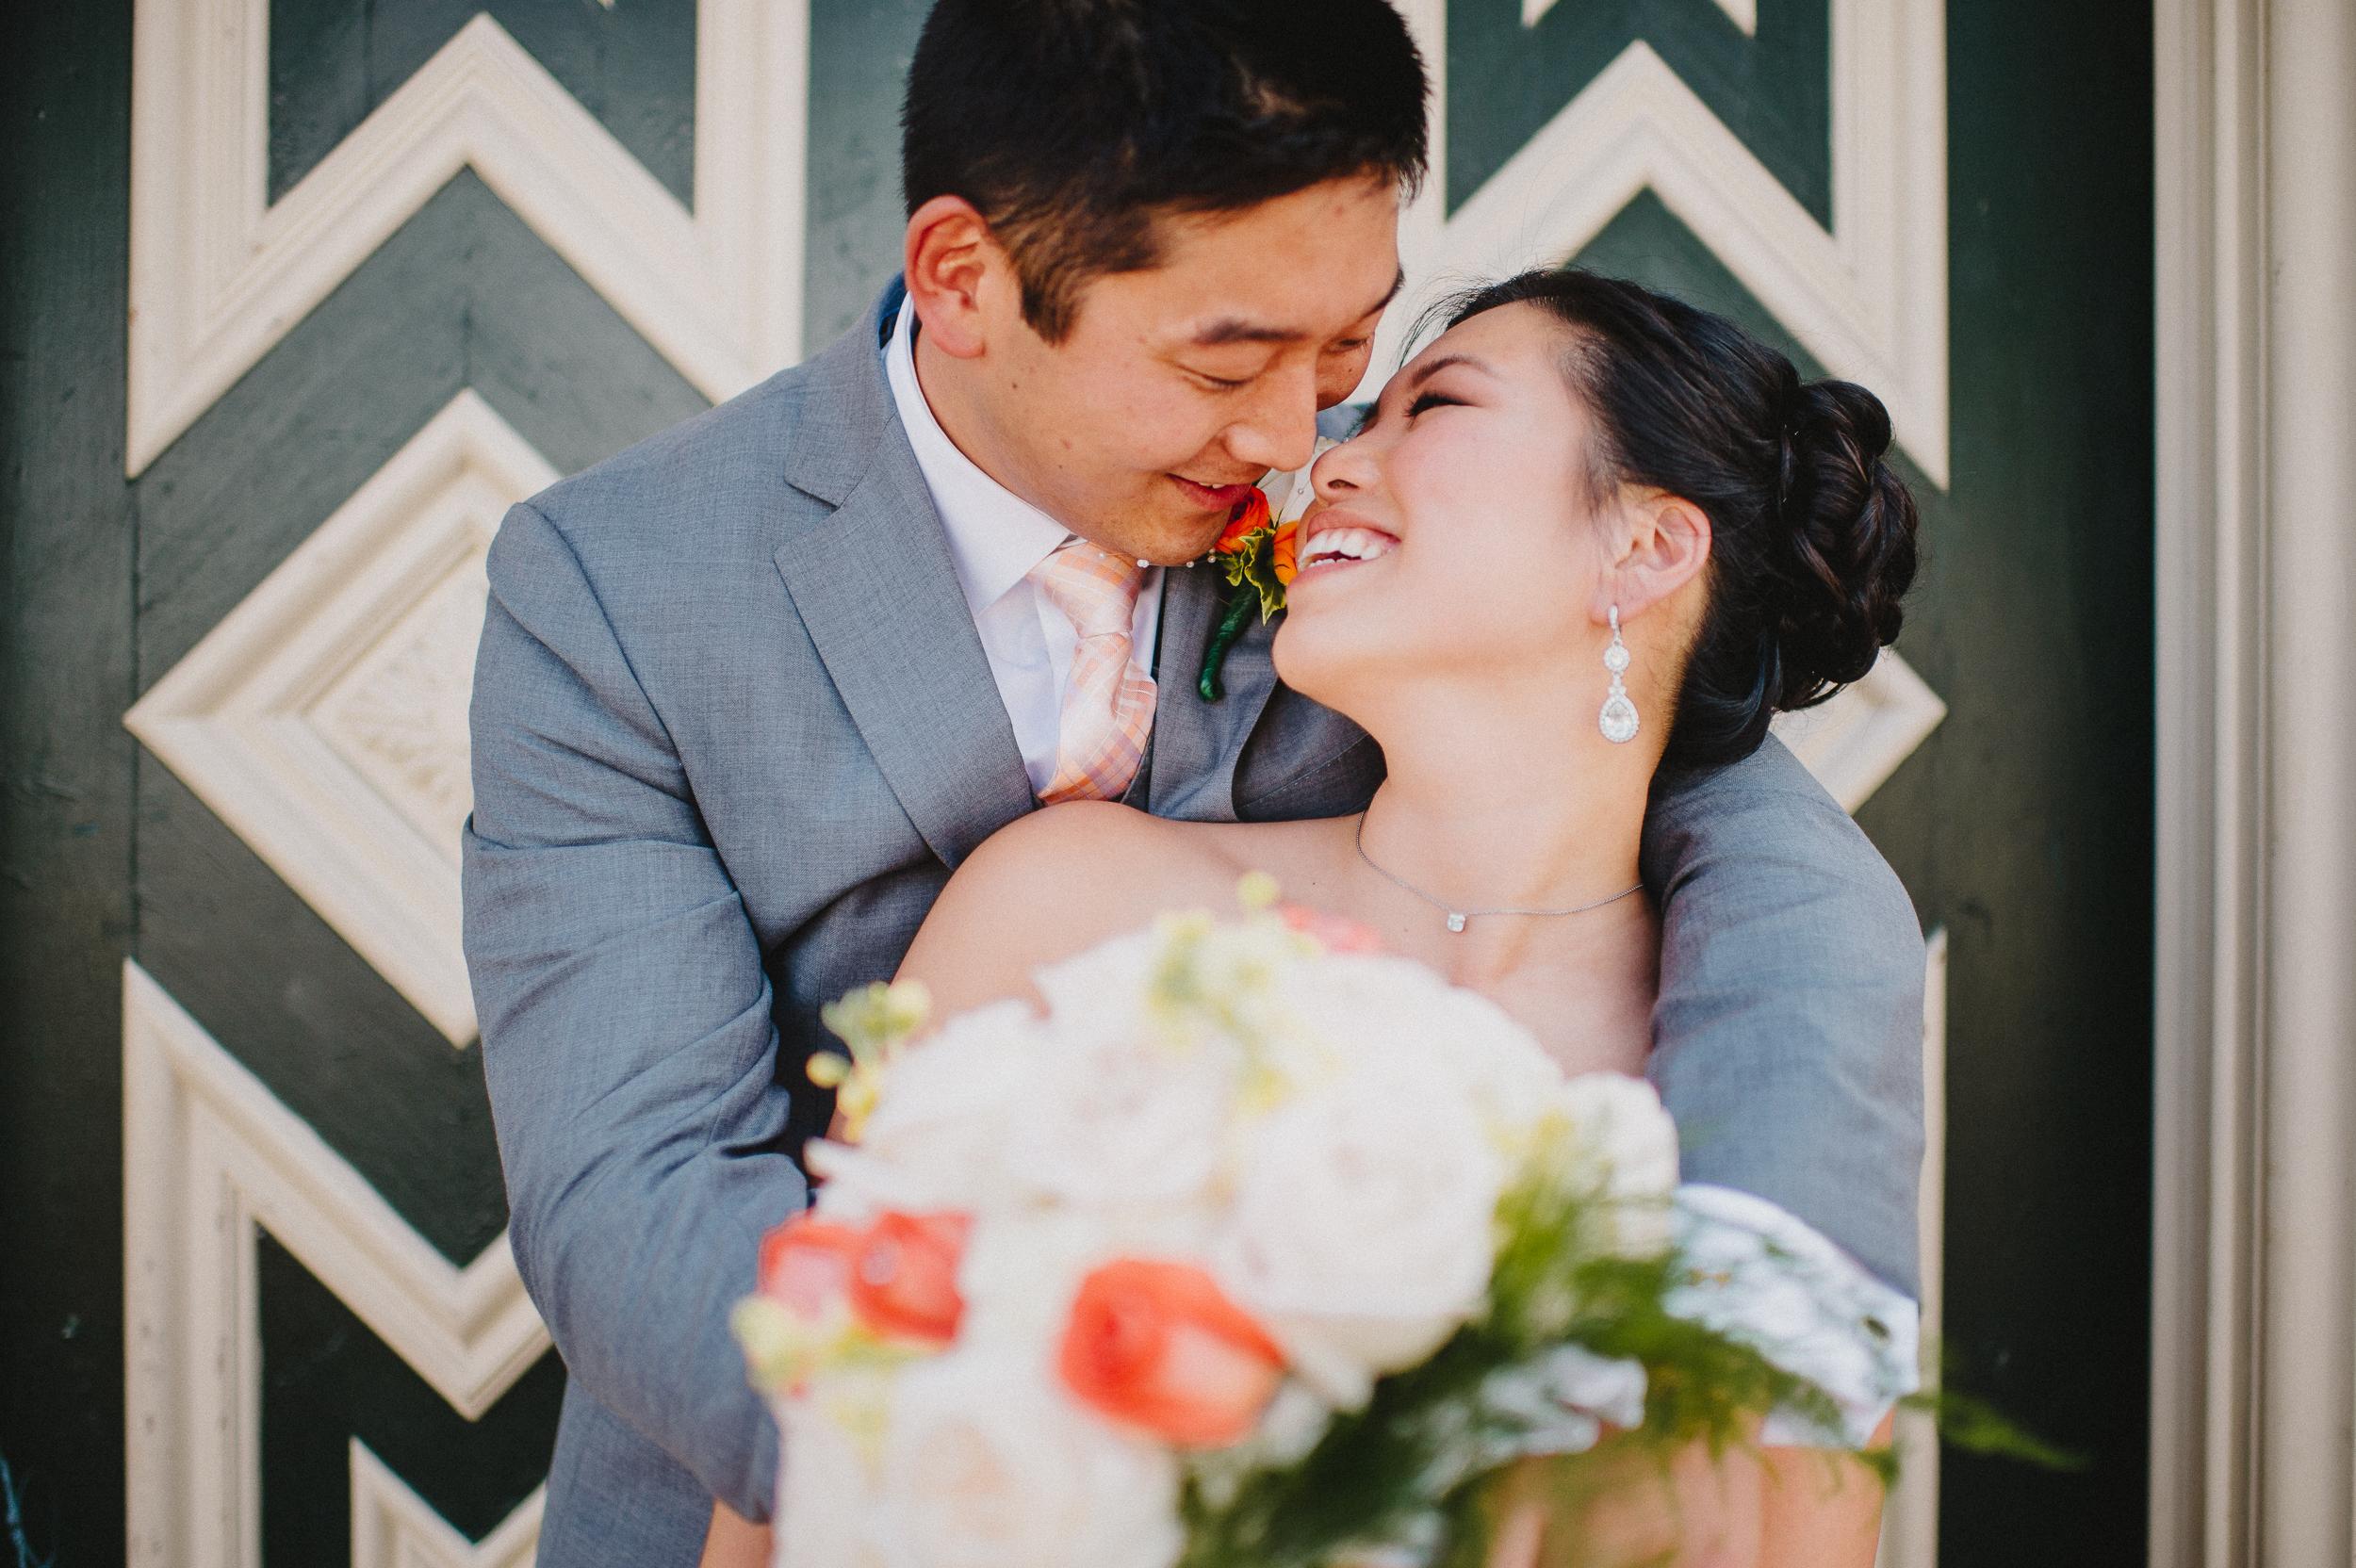 union-trust-philadelphia-wedding-photographer-48.jpg